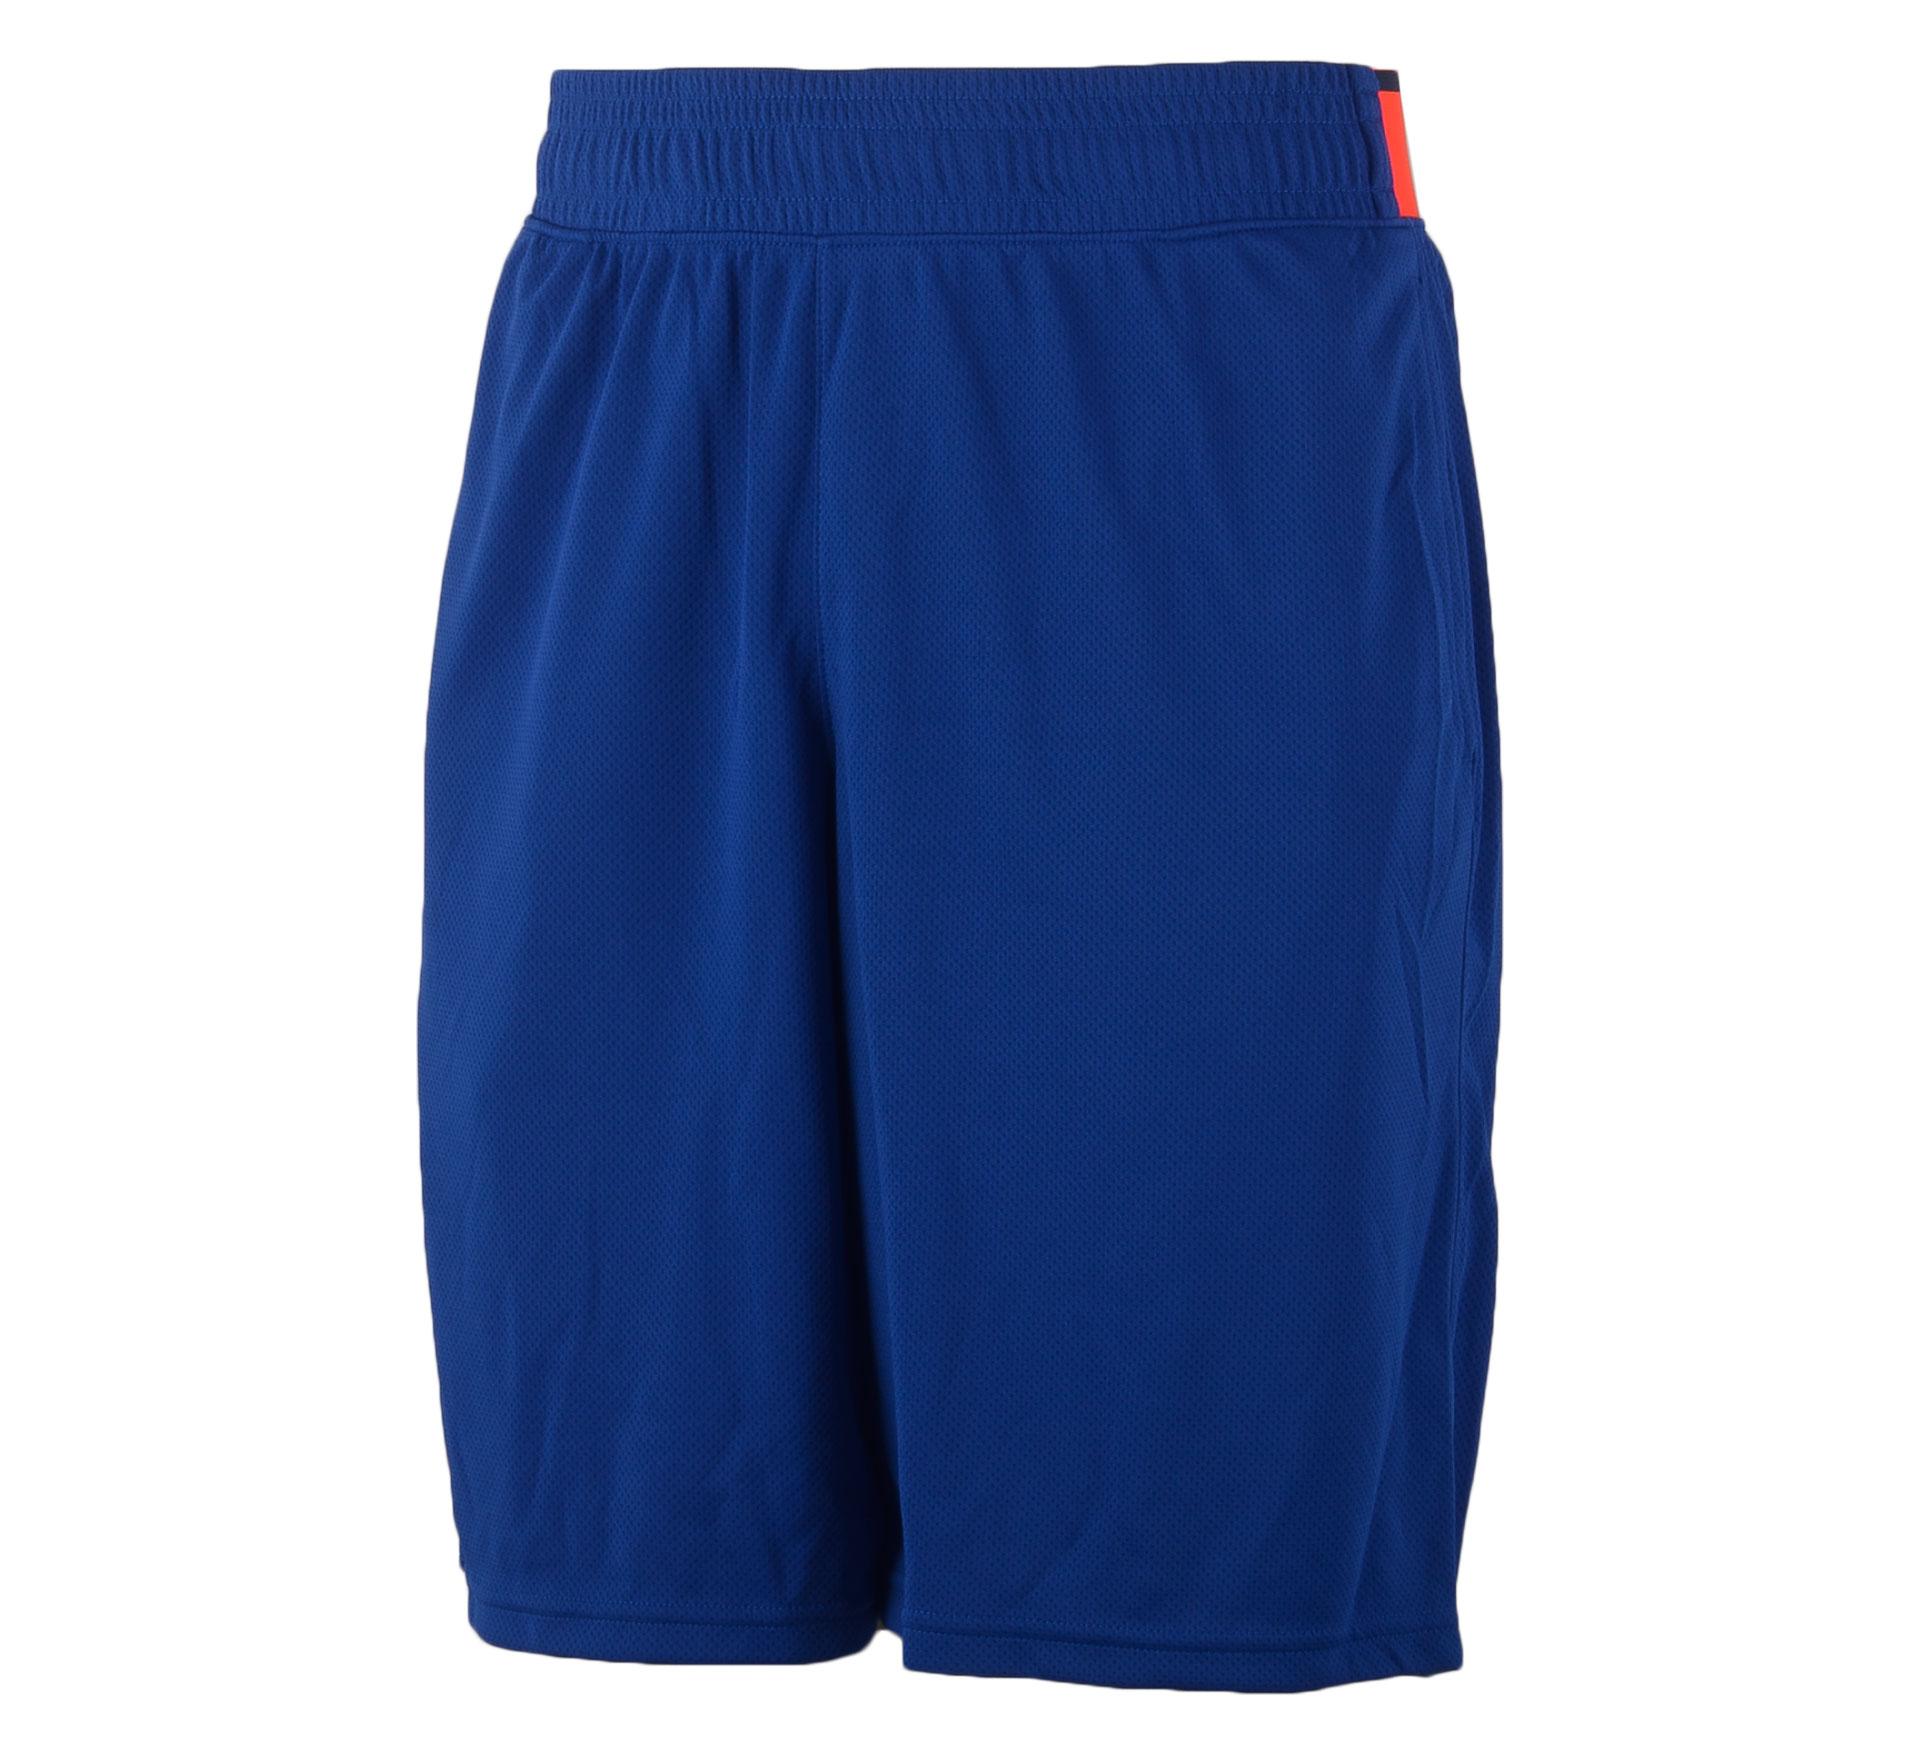 "Under Armour  HeatGear Reflex 10"" Short blauw - rood"